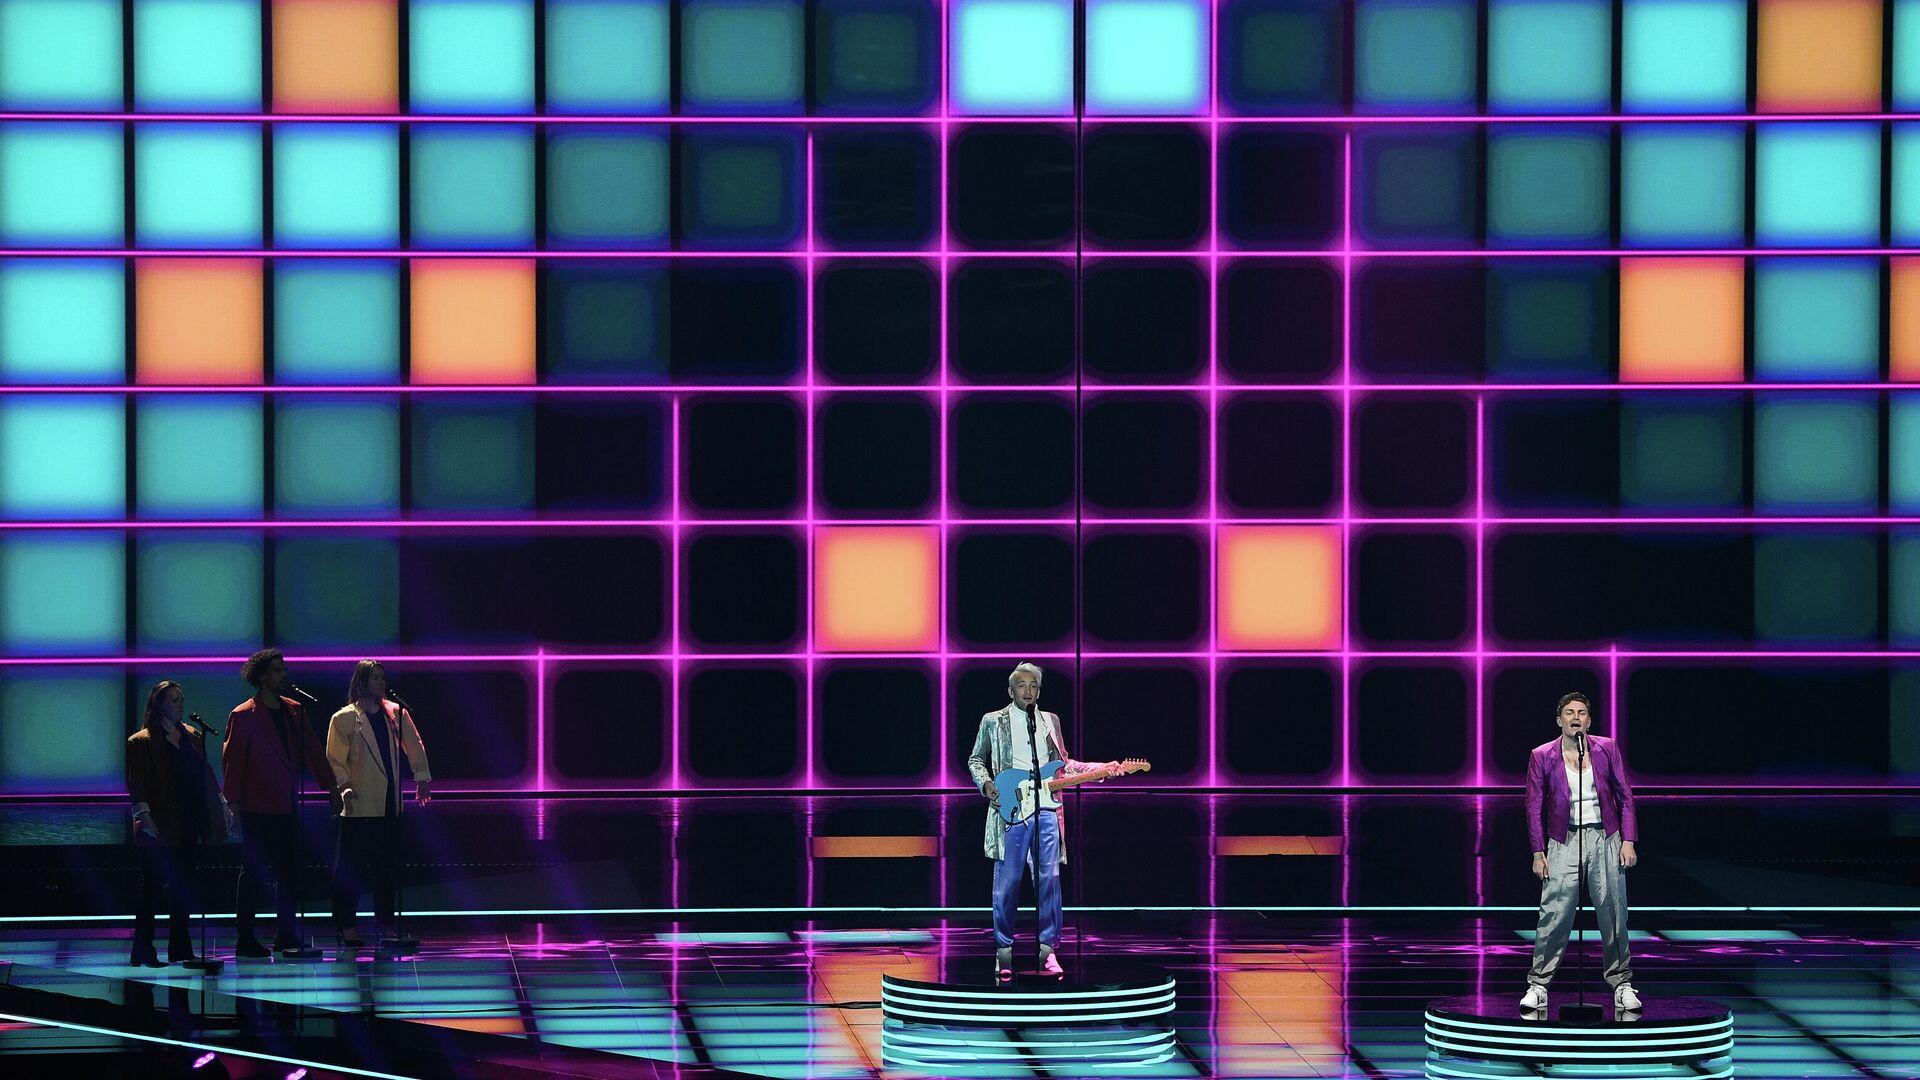 Eurovision 2022 - Sputnik Italia, 1920, 20.05.2021